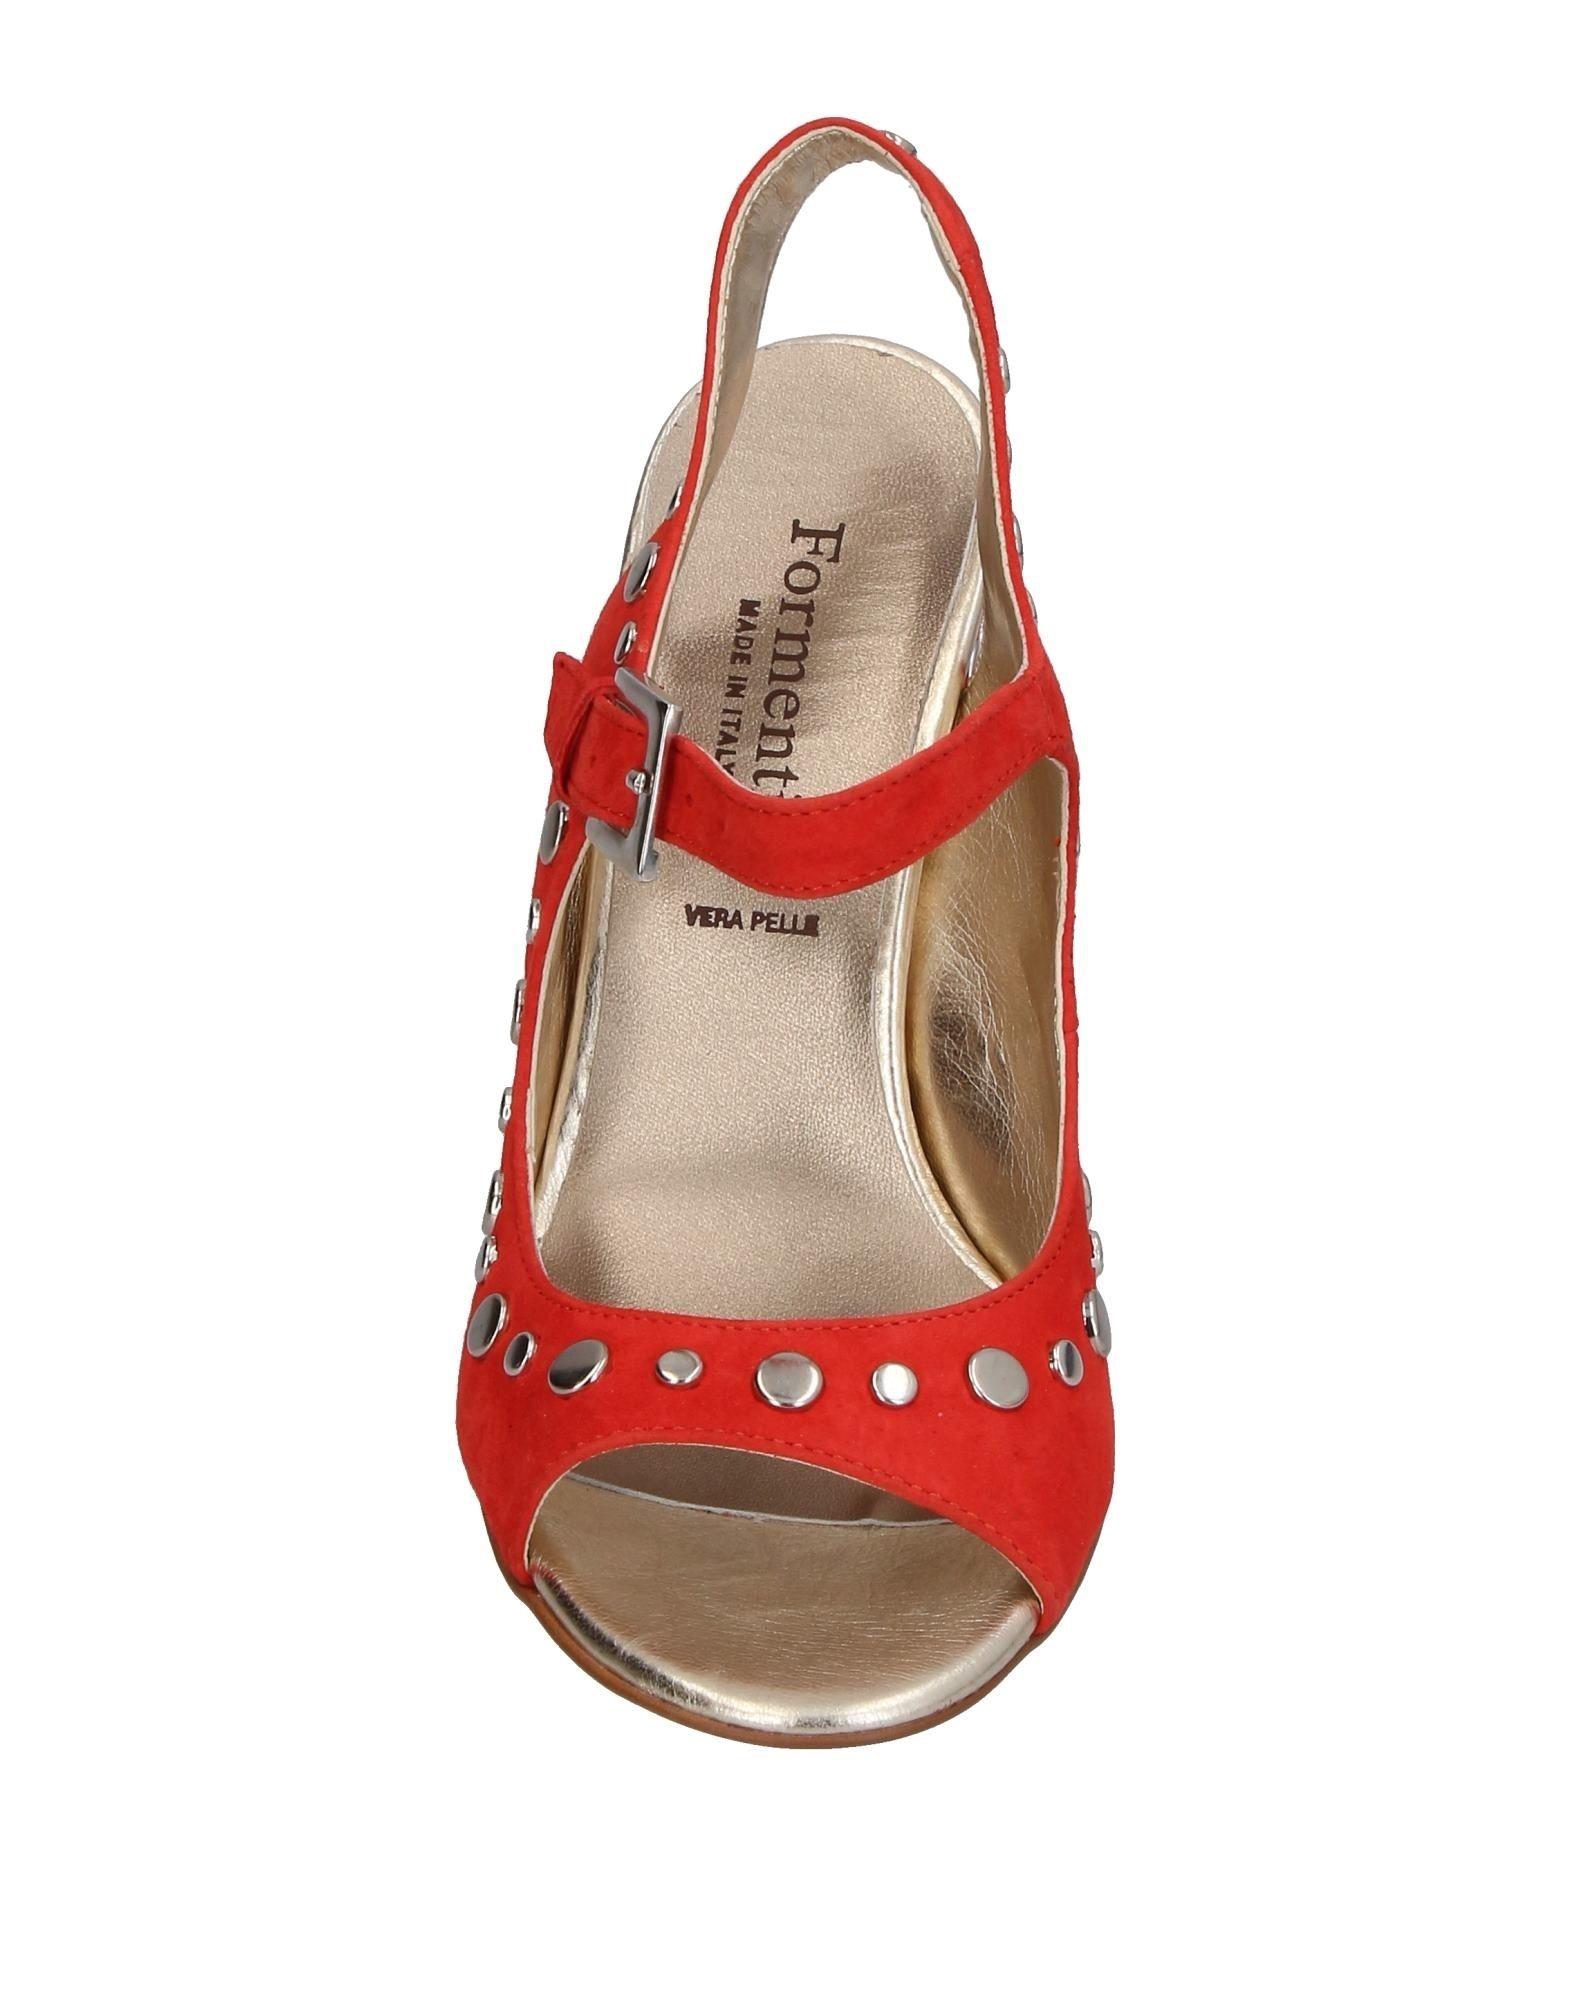 Formentini Sandalen Damen  11375916QE Gute Qualität beliebte Schuhe